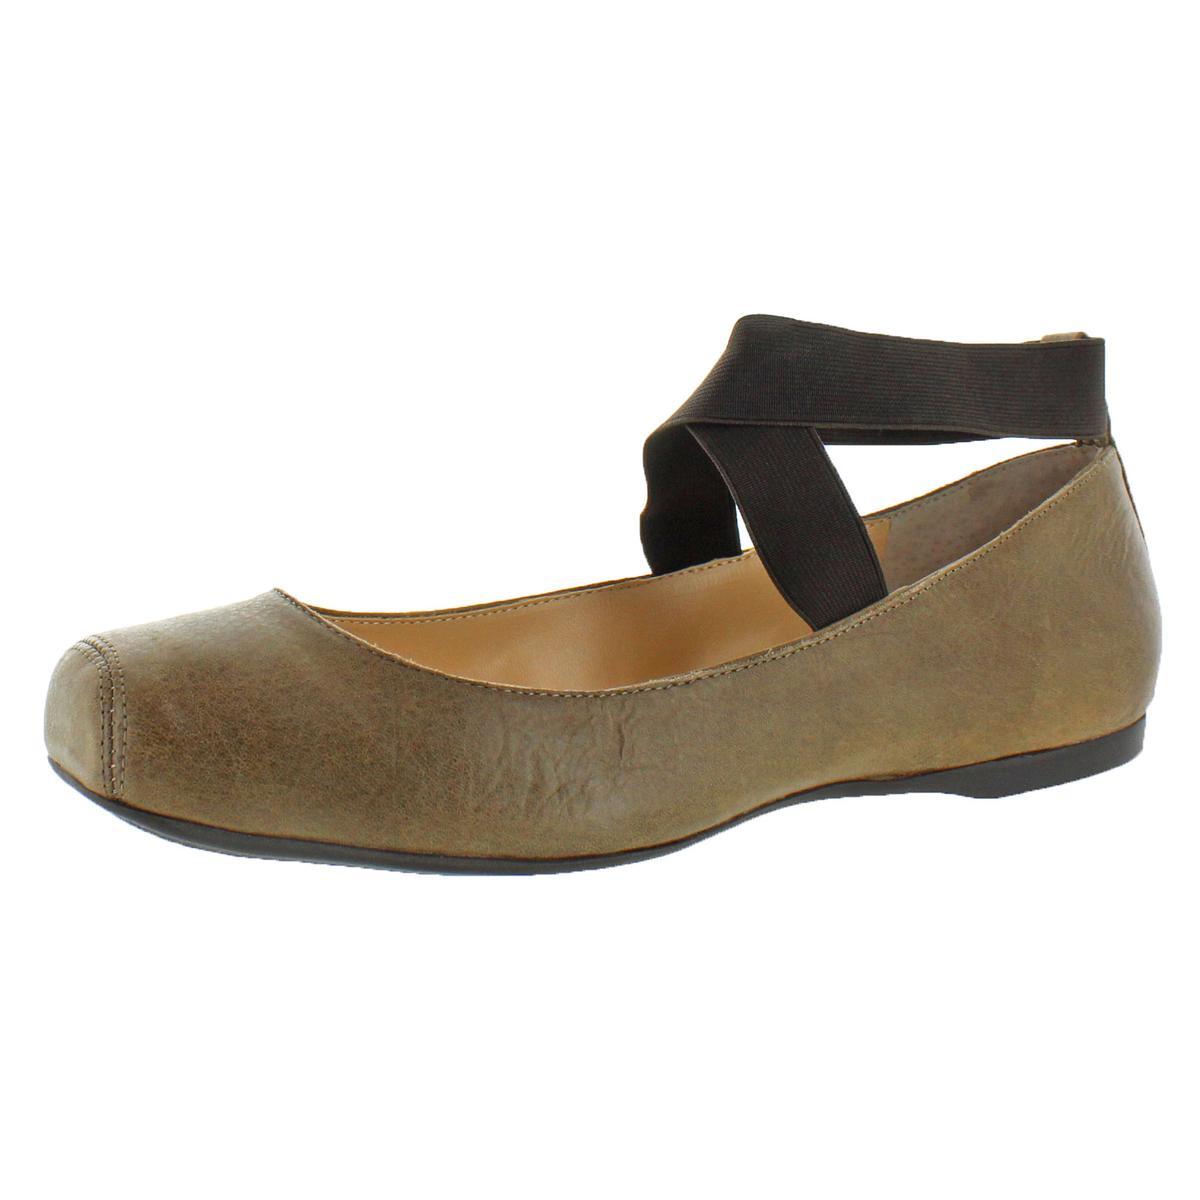 Jessica-Simpson-Women-039-s-Mandalaye-Square-Toe-Ankle-Wrap-Ballet-Flats thumbnail 4